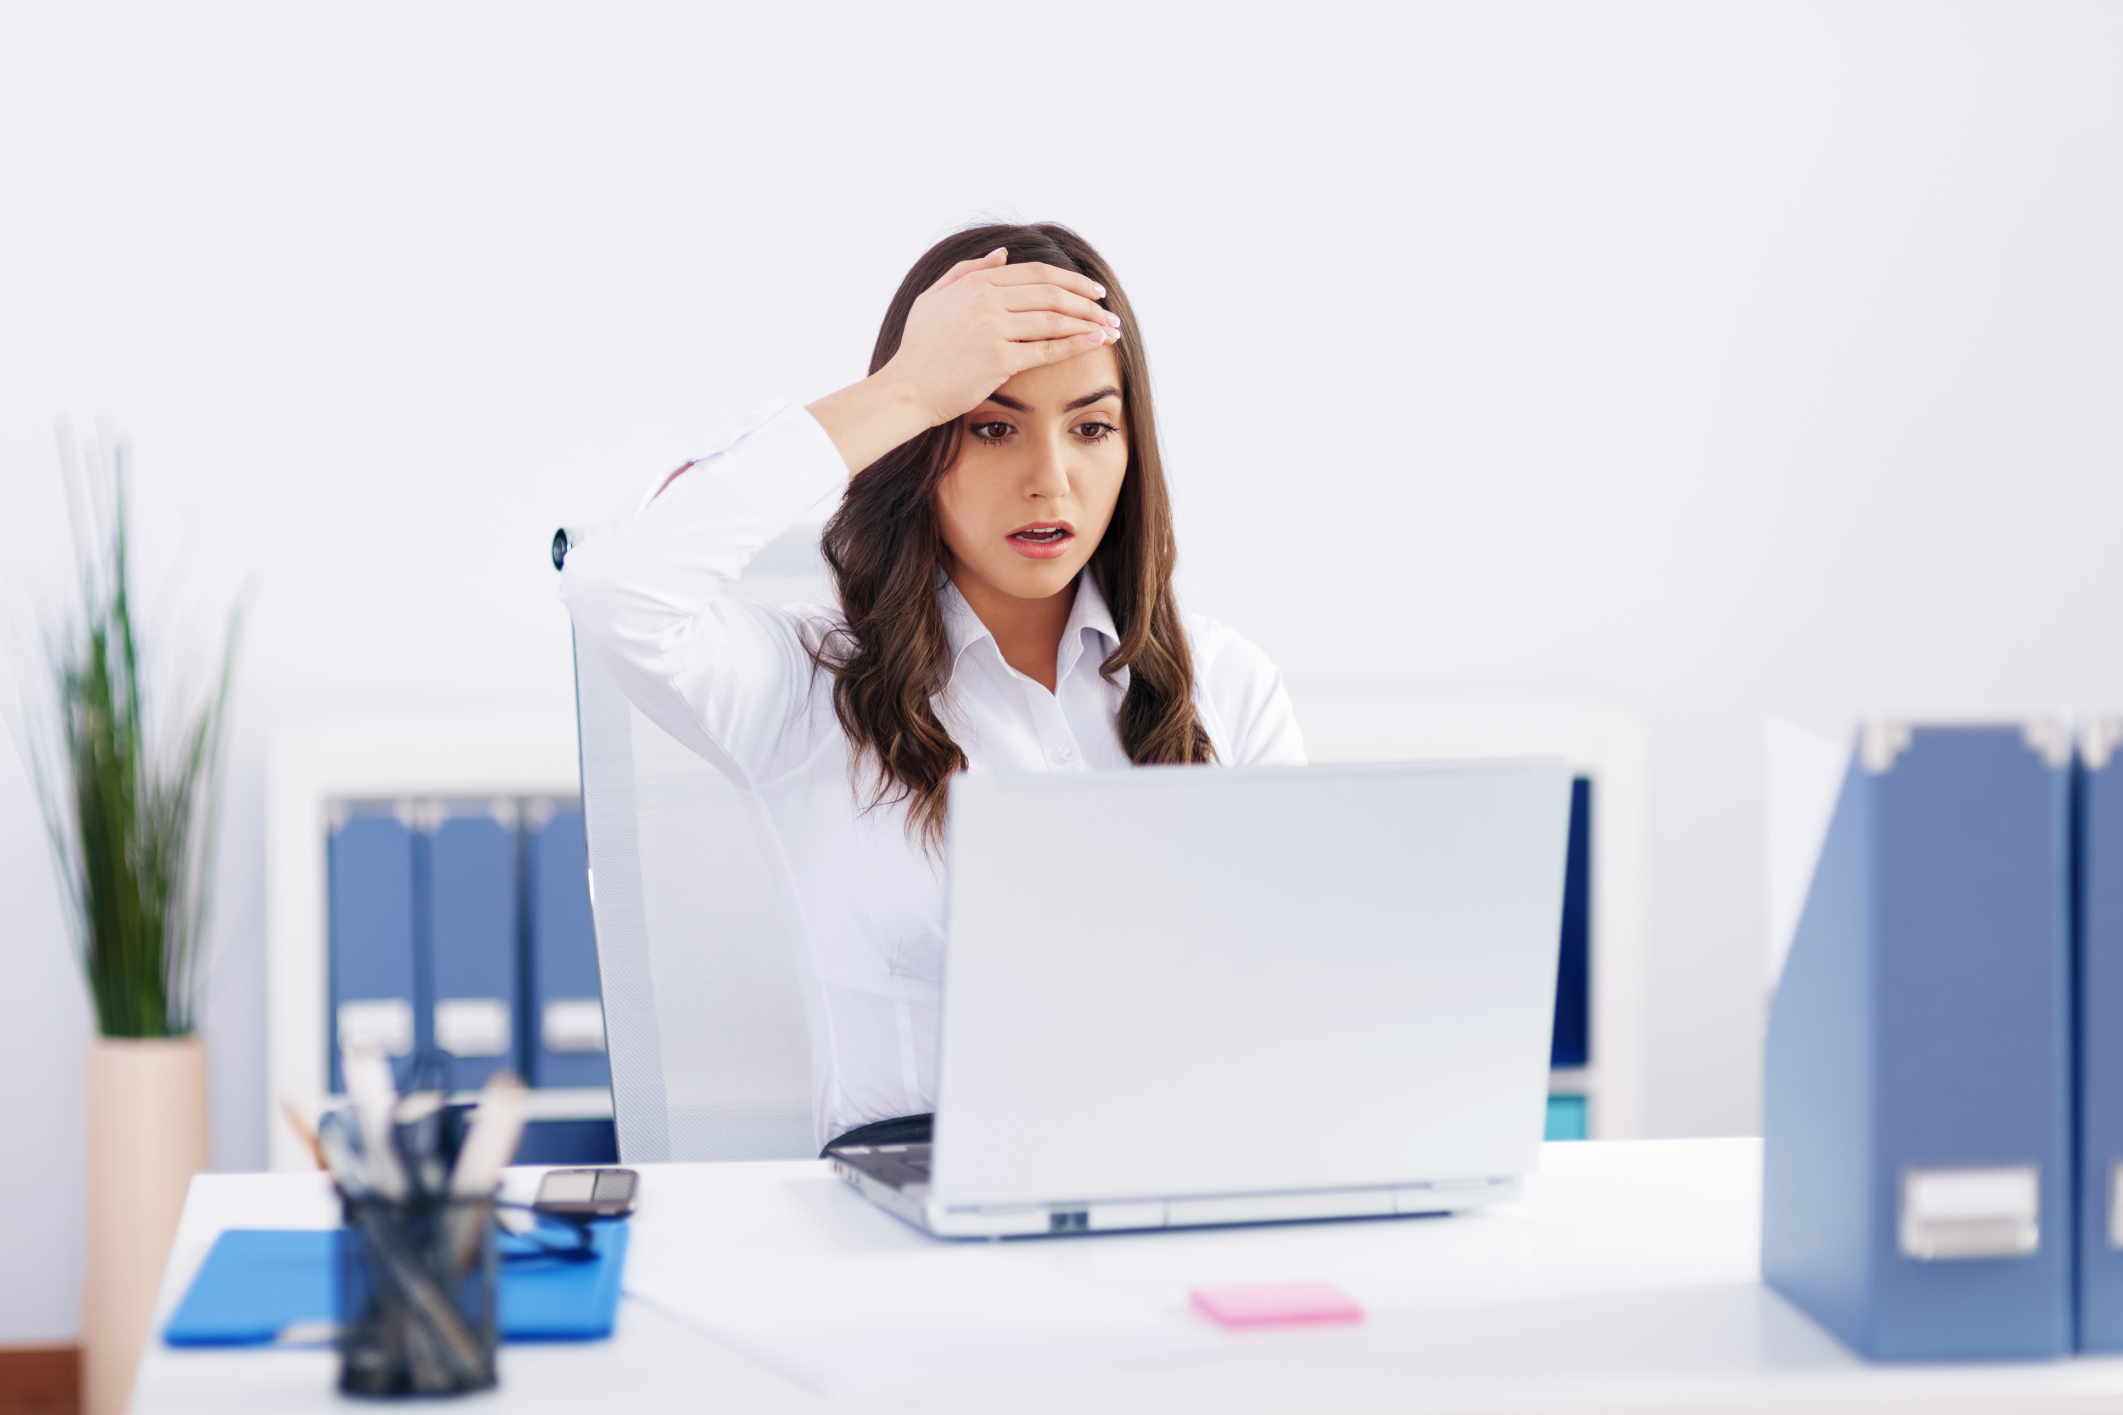 error-computadora-fallo-estres-problema_ELFIMA20150129_0006_1